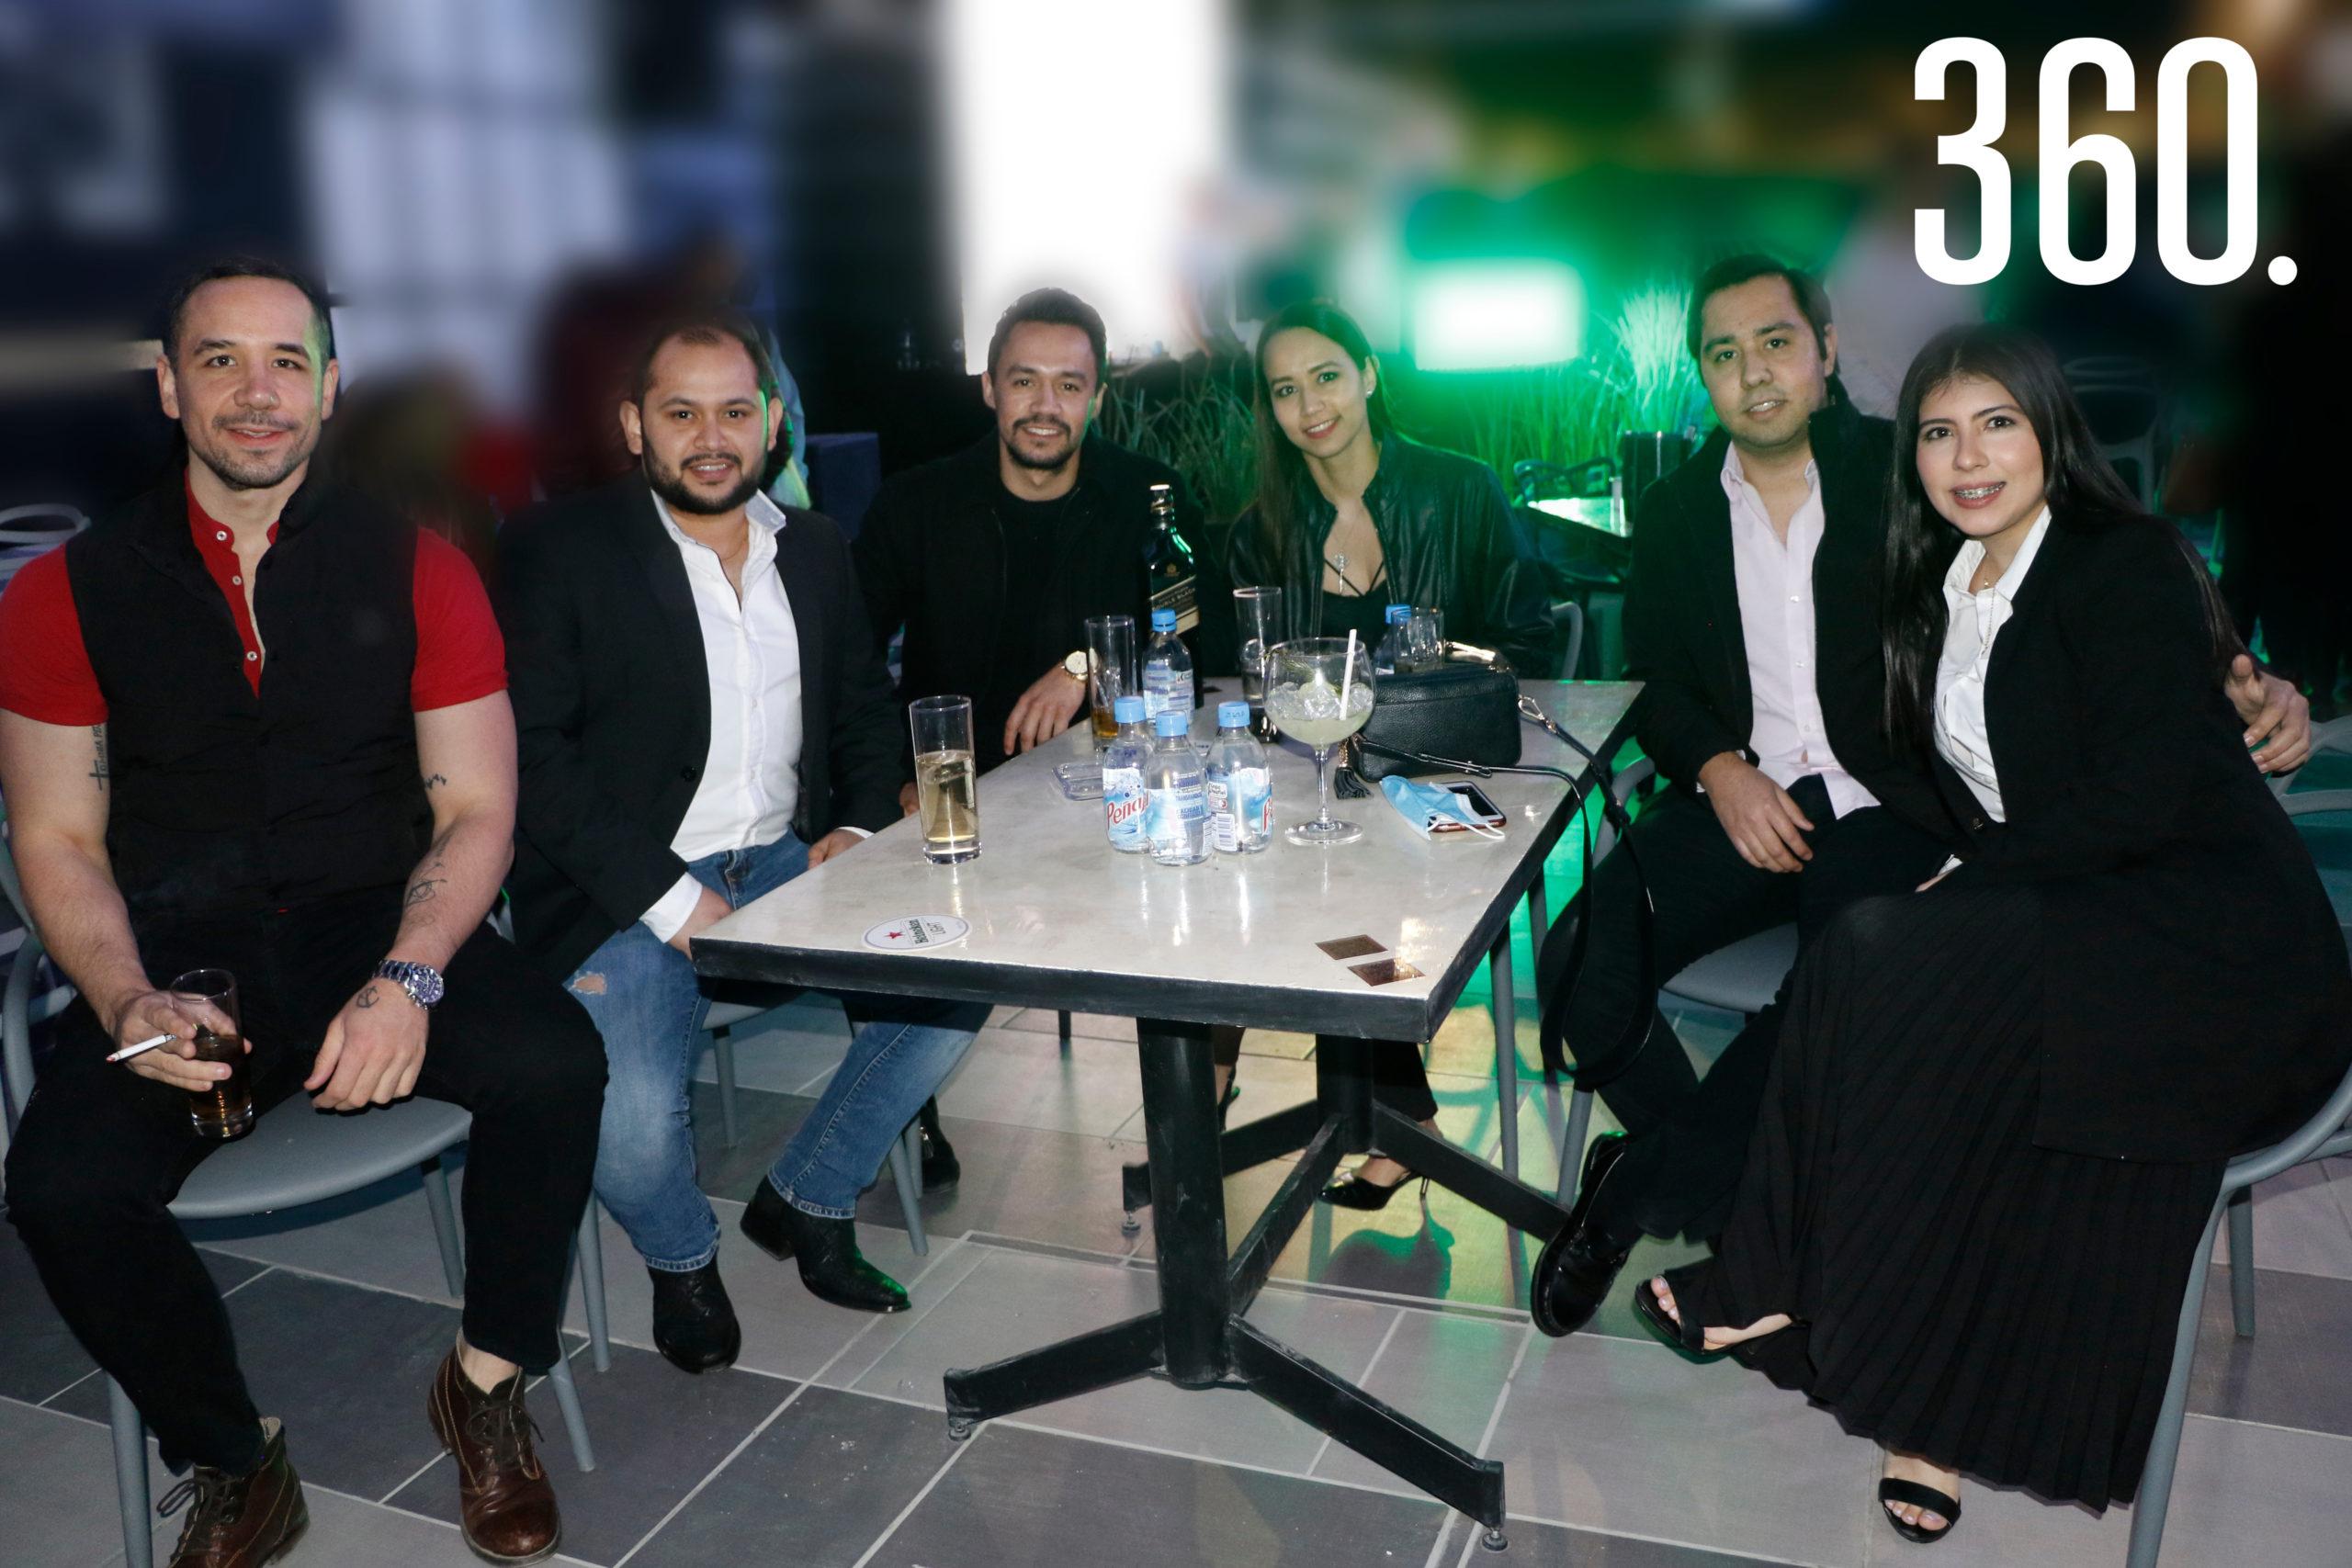 Erick Silveira, Damián Cárdenas, Armando Ballesteros, Abril Ballesteros, Alan Ballesteros y María Antonieta Gómez.